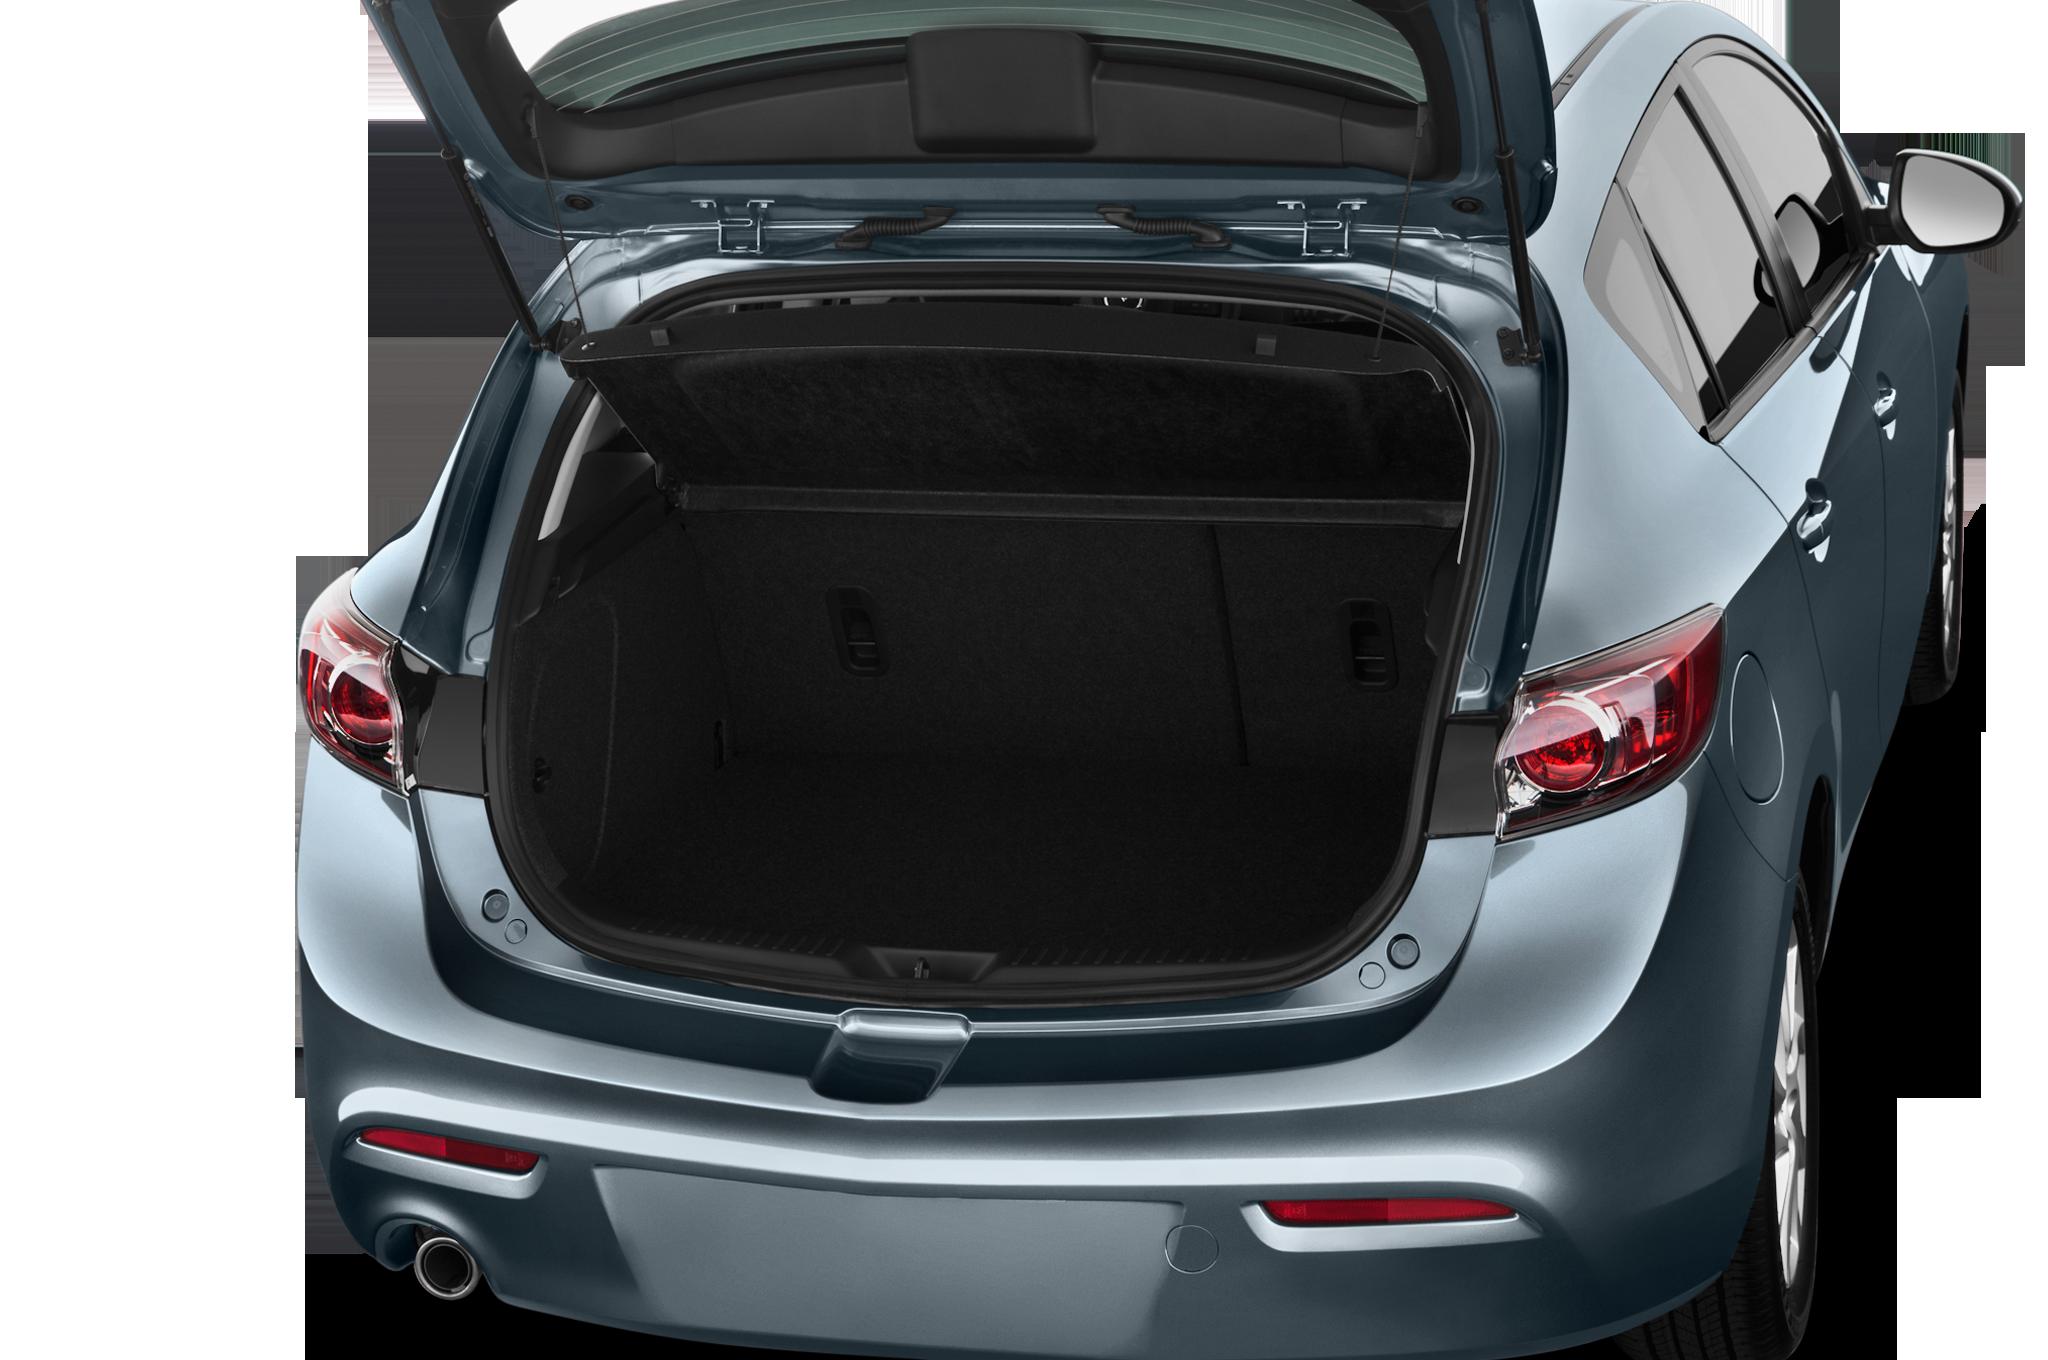 First Drive 2012 Mazda3 i Grand Touring SkyActivG Sedan